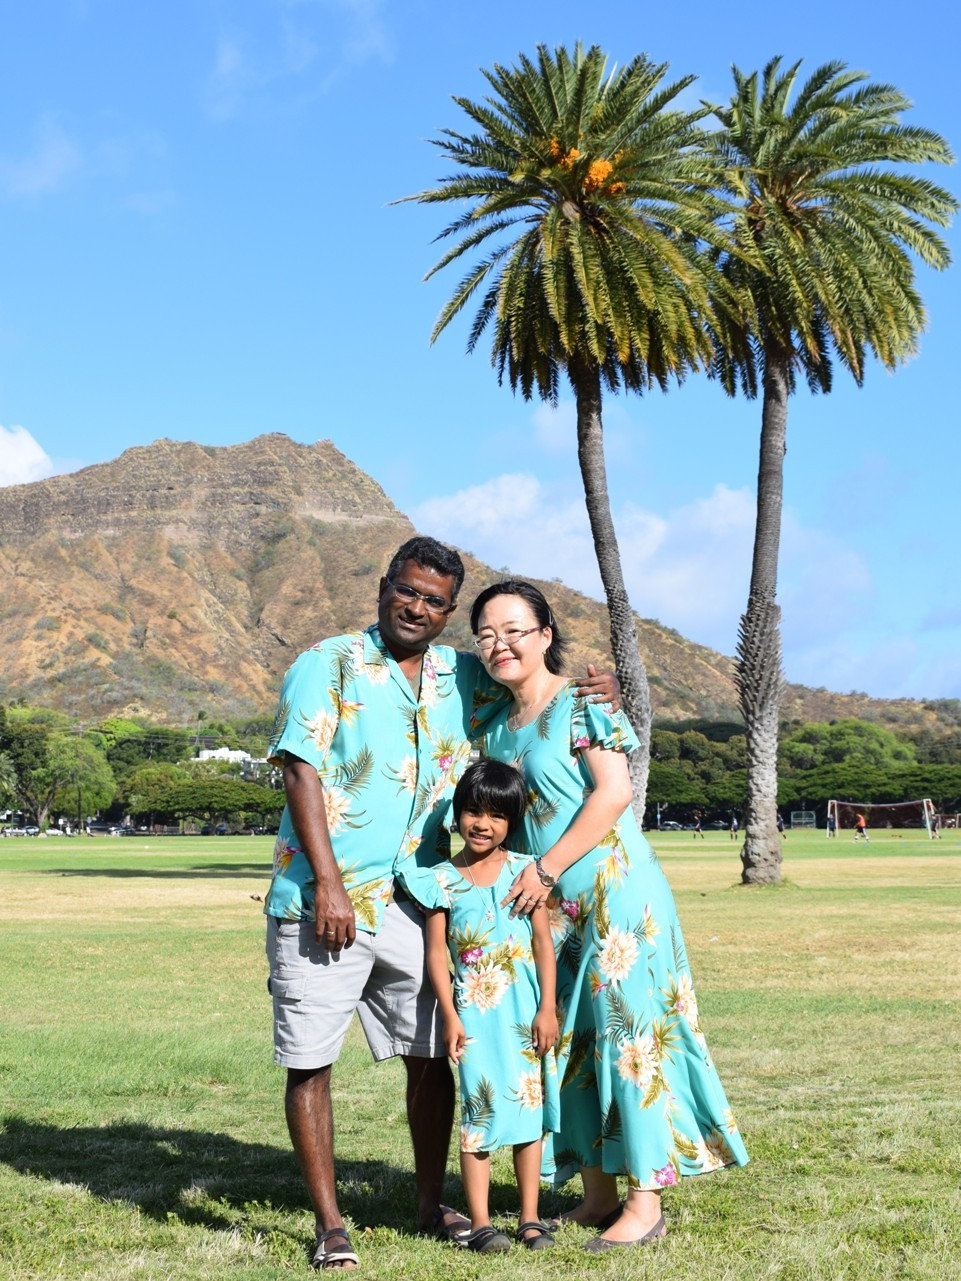 Family photo shoot in Hawaii